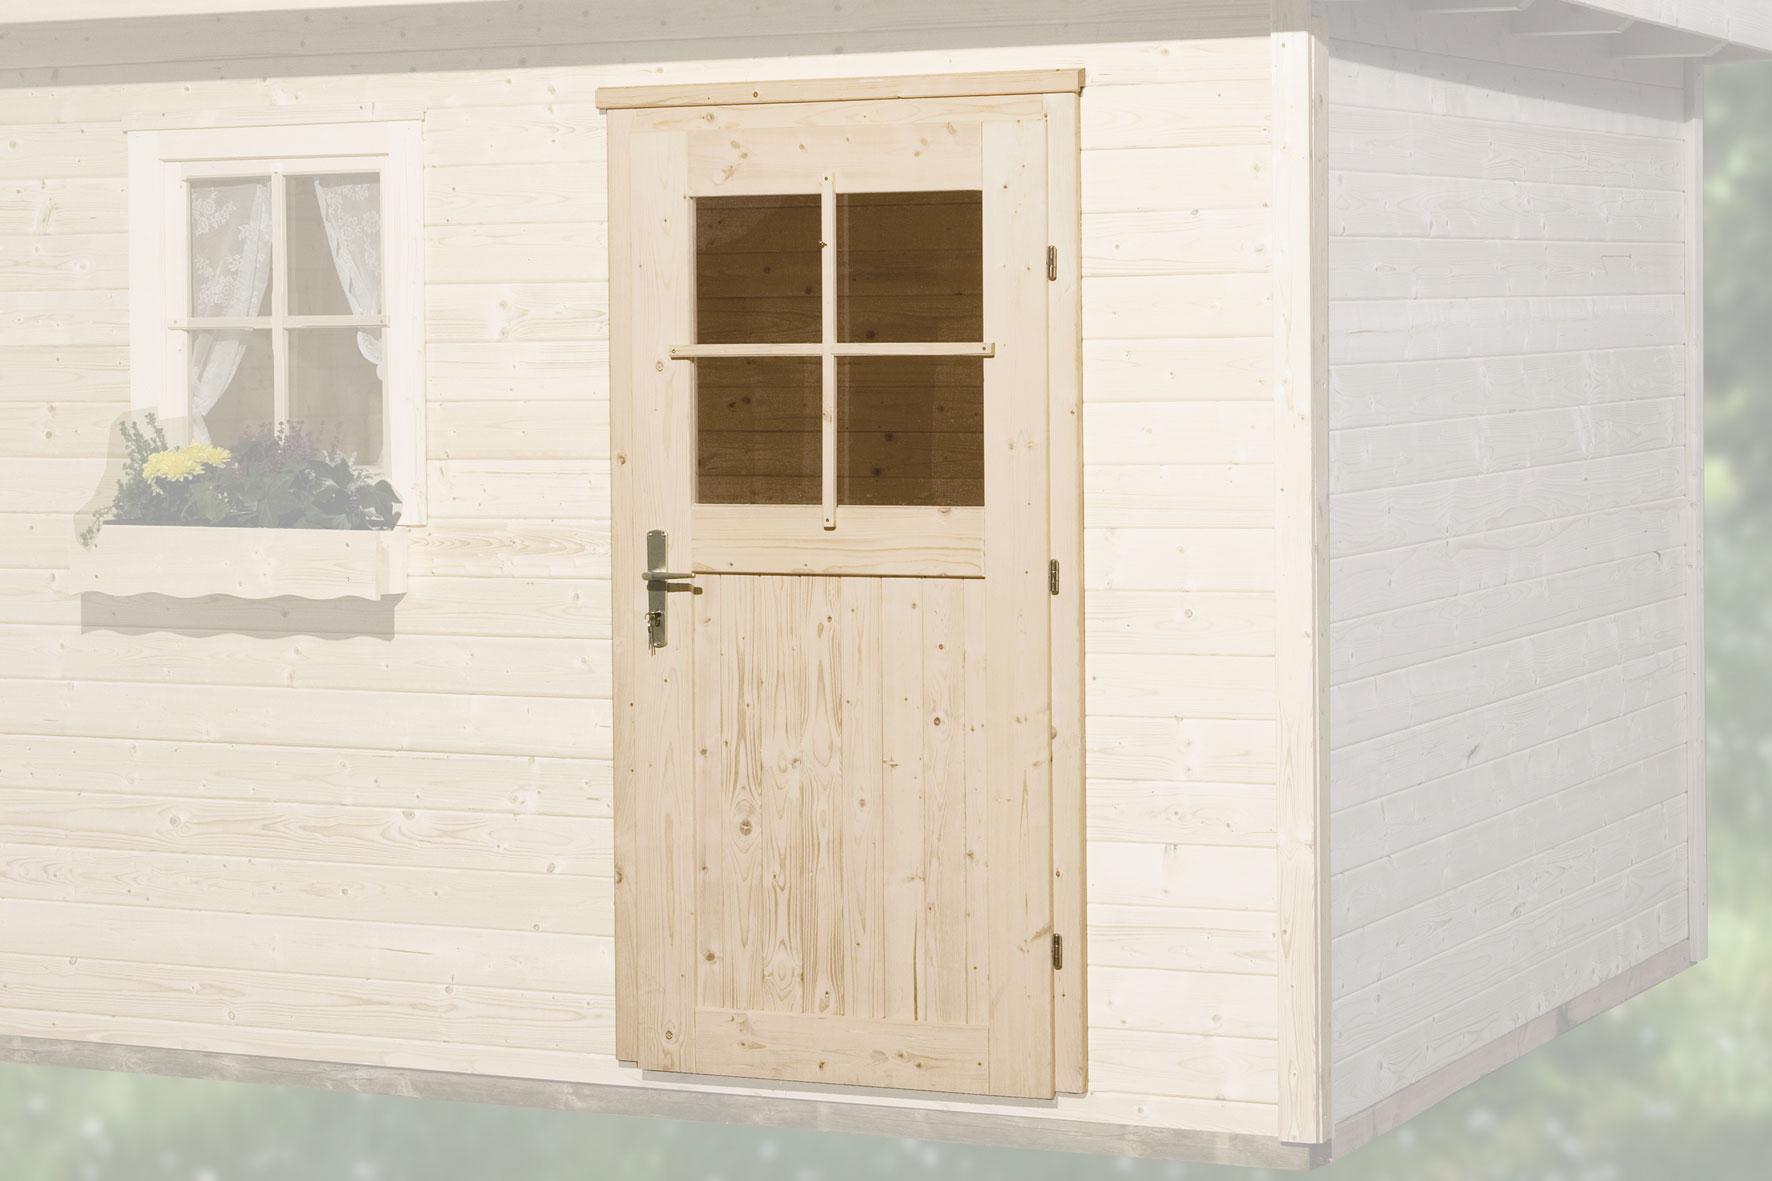 Gartenhaustür für Wandstärke 45 mm 182x97cm Bild 1